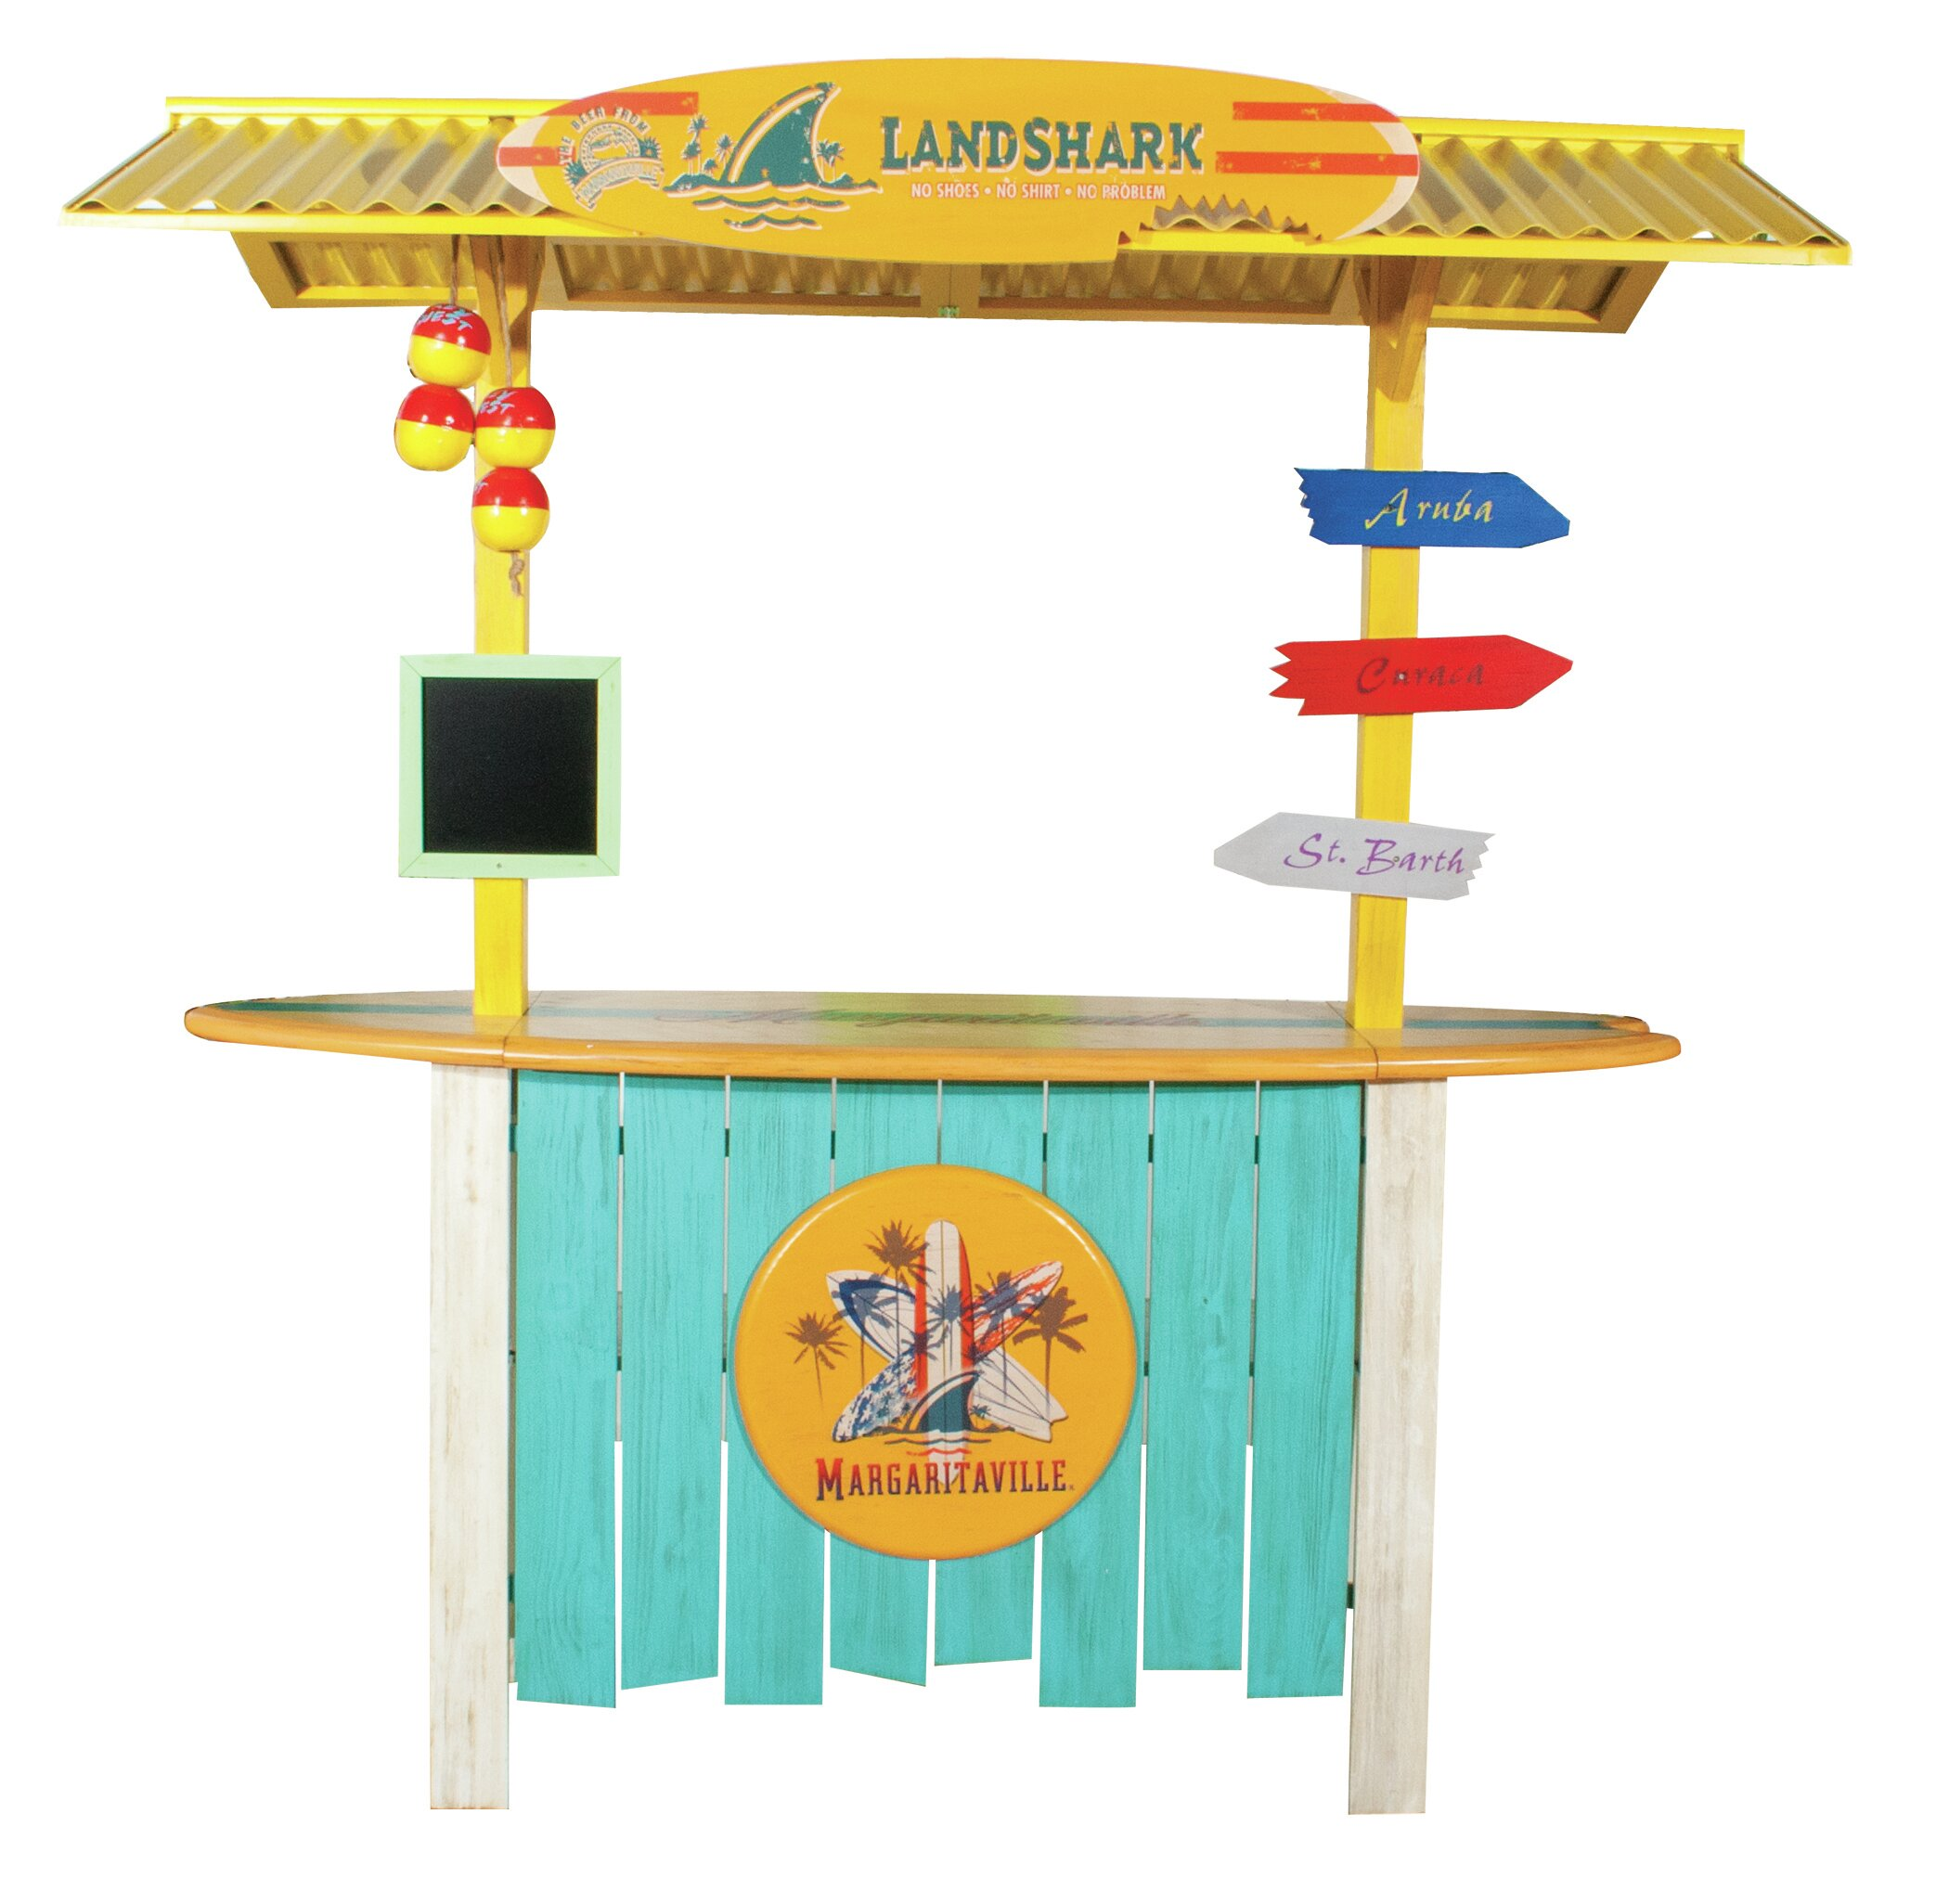 Margaritaville Landshark Tiki Bar U0026 Reviews | Wayfair